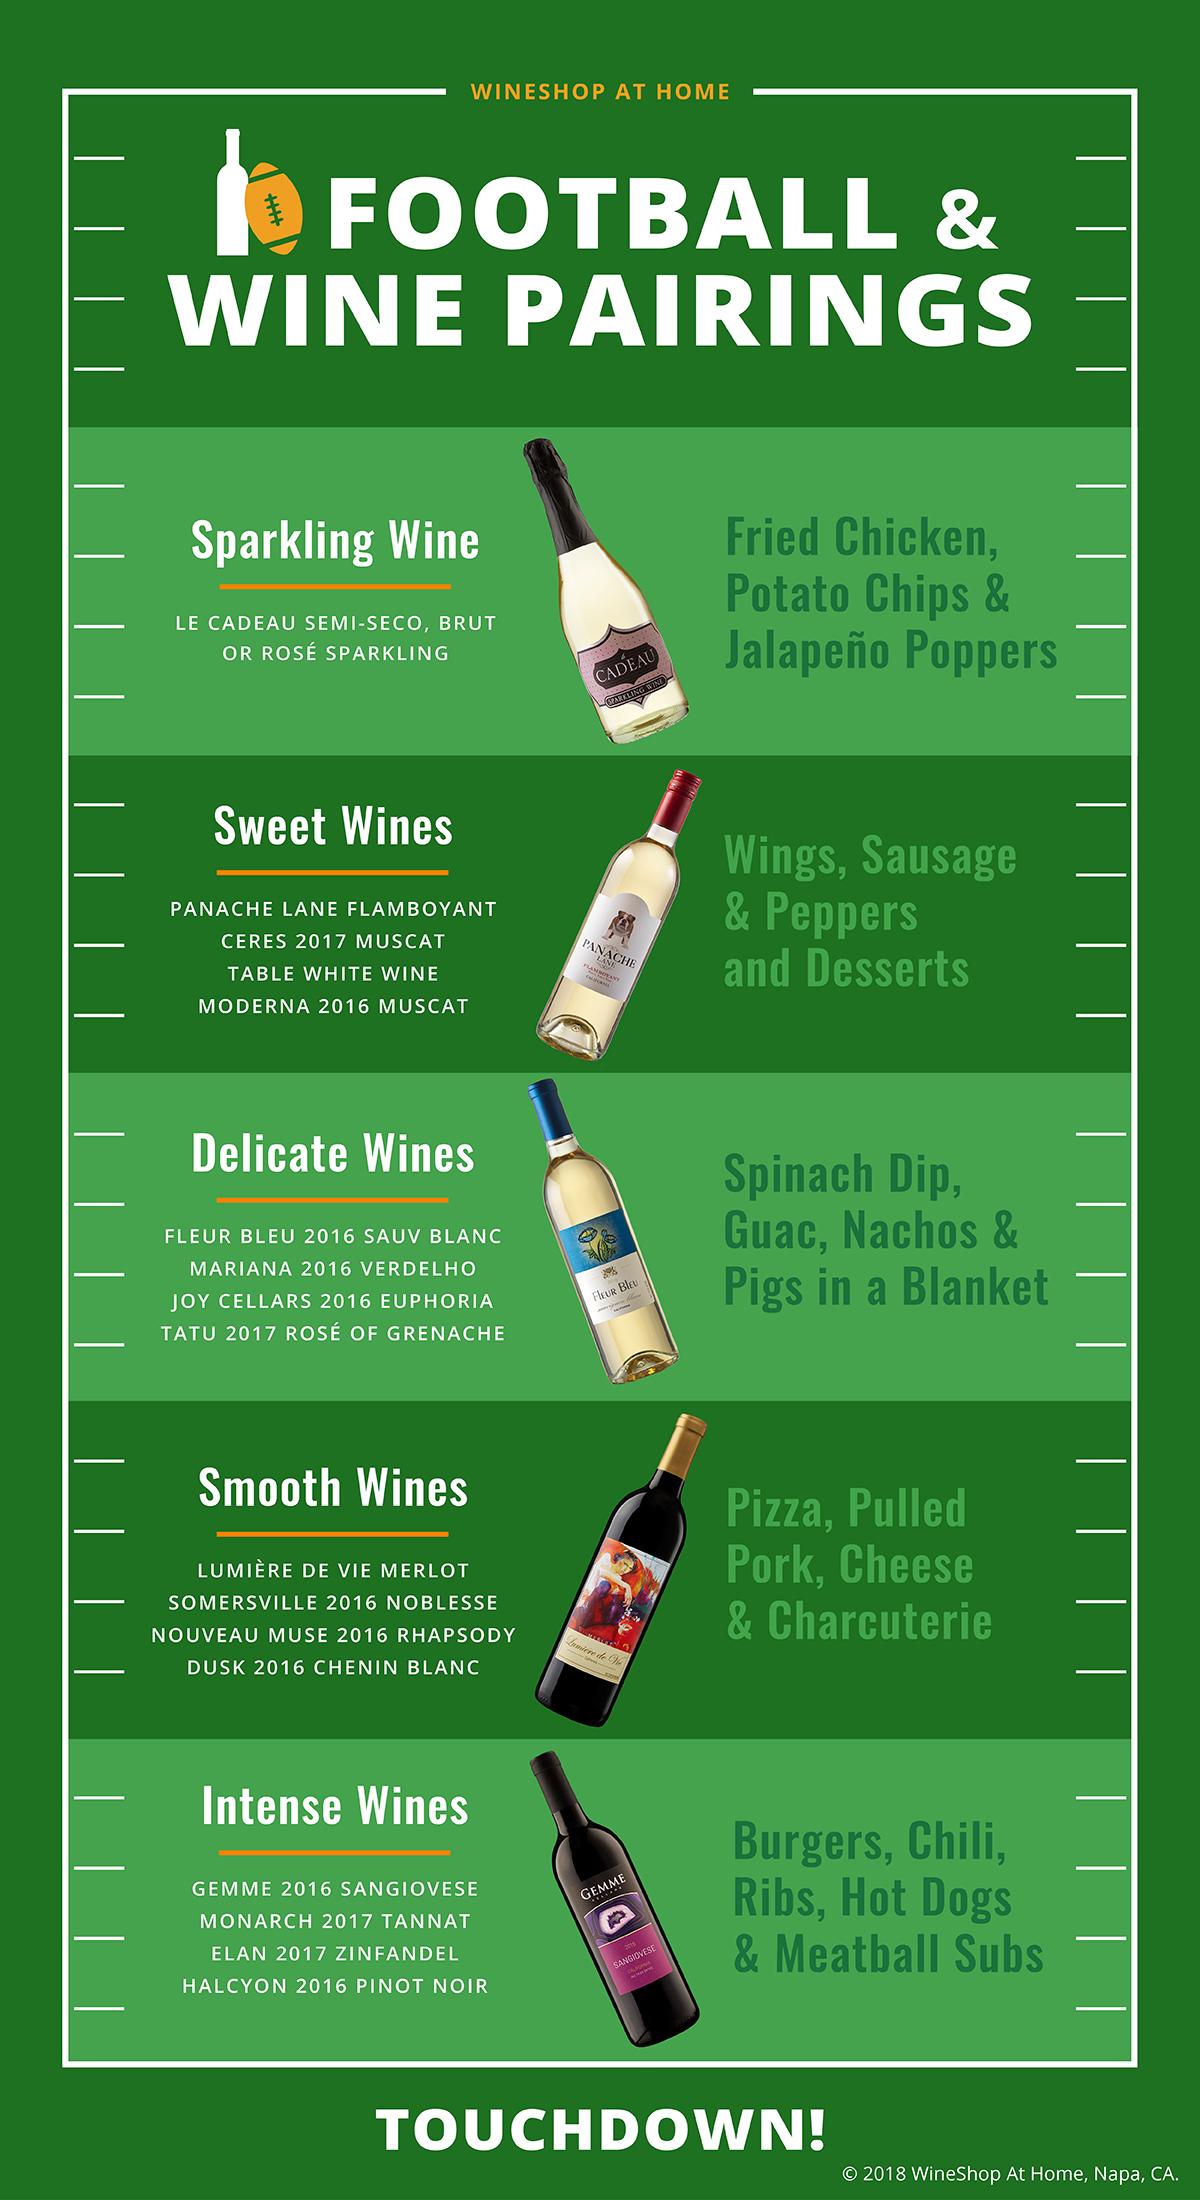 WineShop At Home Football & Wine Pairings